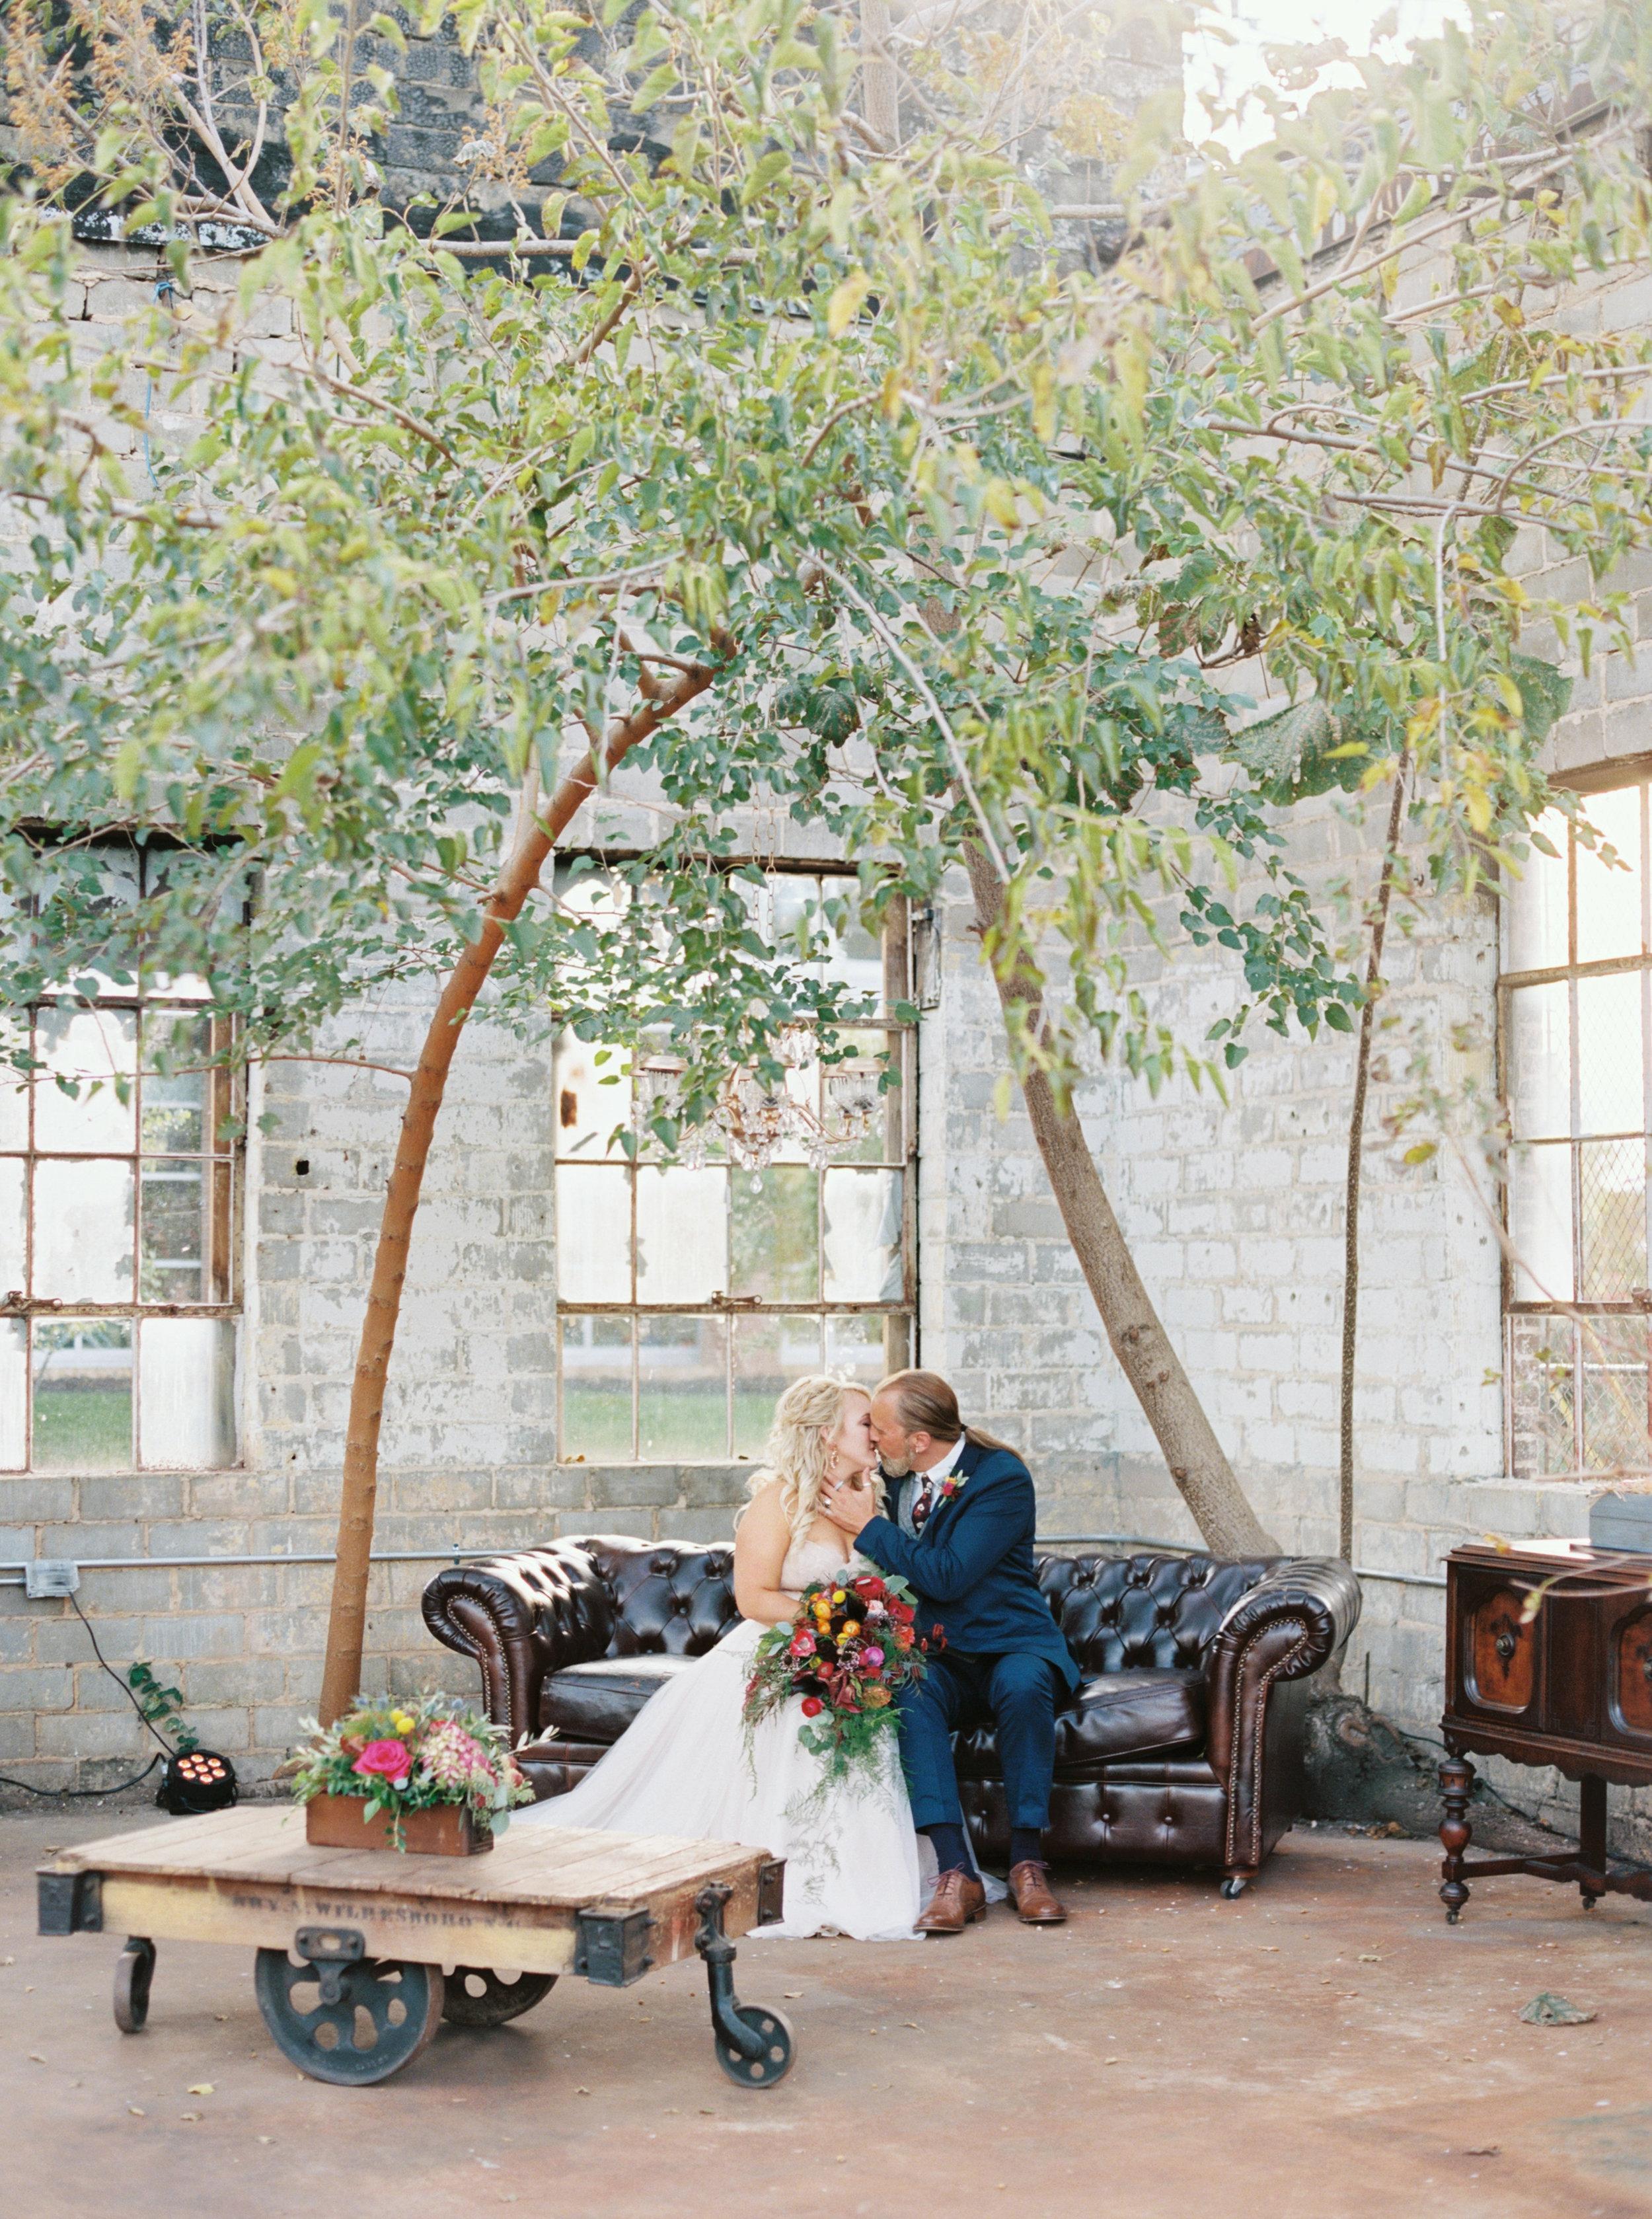 Mandi_Oliver_Chattanooga_Wedding_Abigail_Malone_Photography_Film-292.jpg